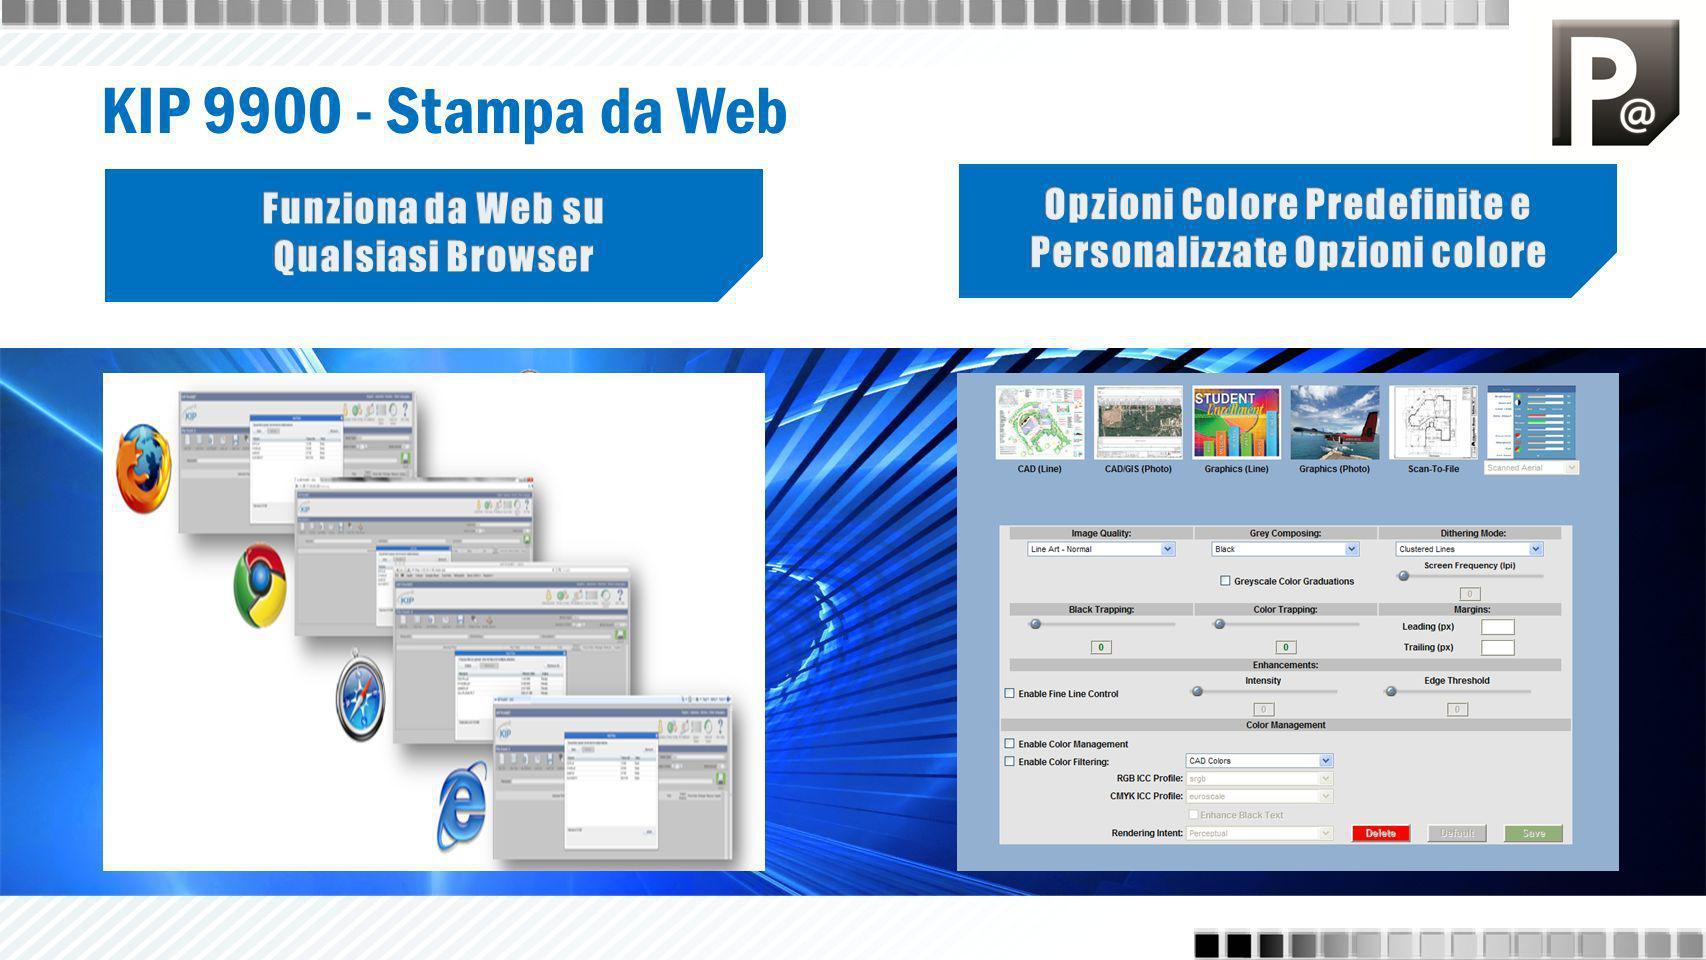 KIP 9900 - Stampa da Web